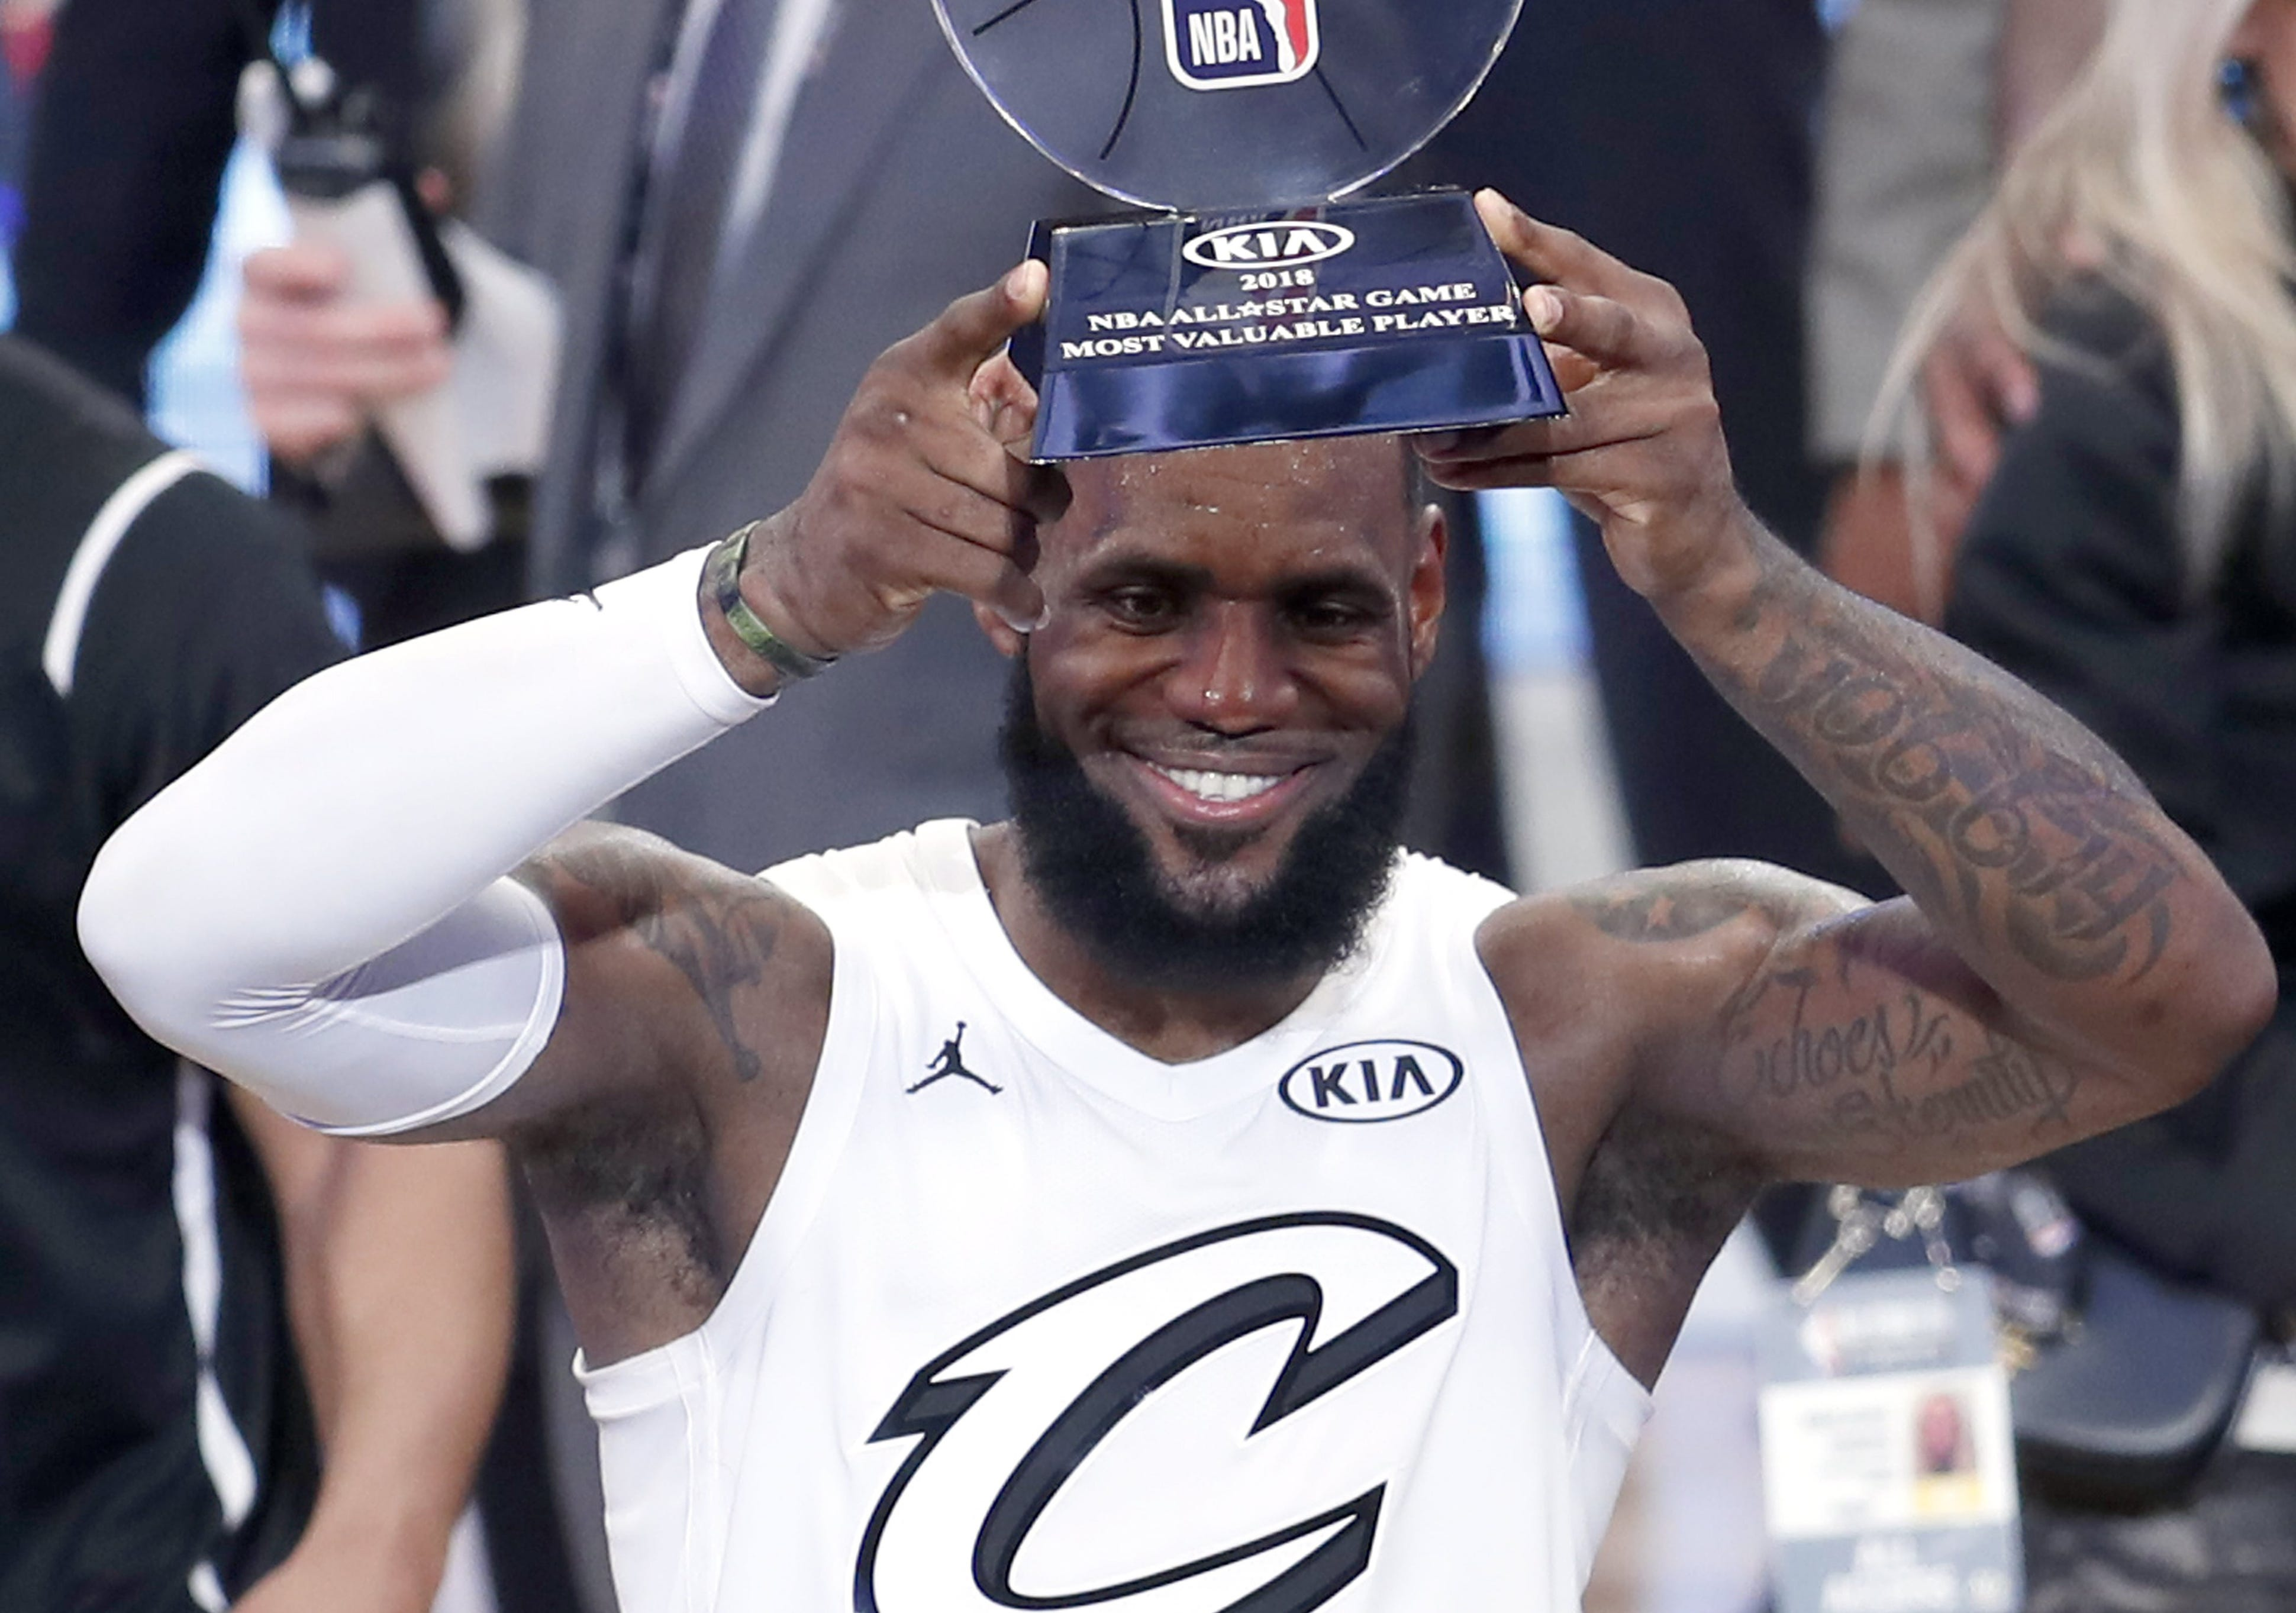 LeBron James shared 2018 All-Star MVP